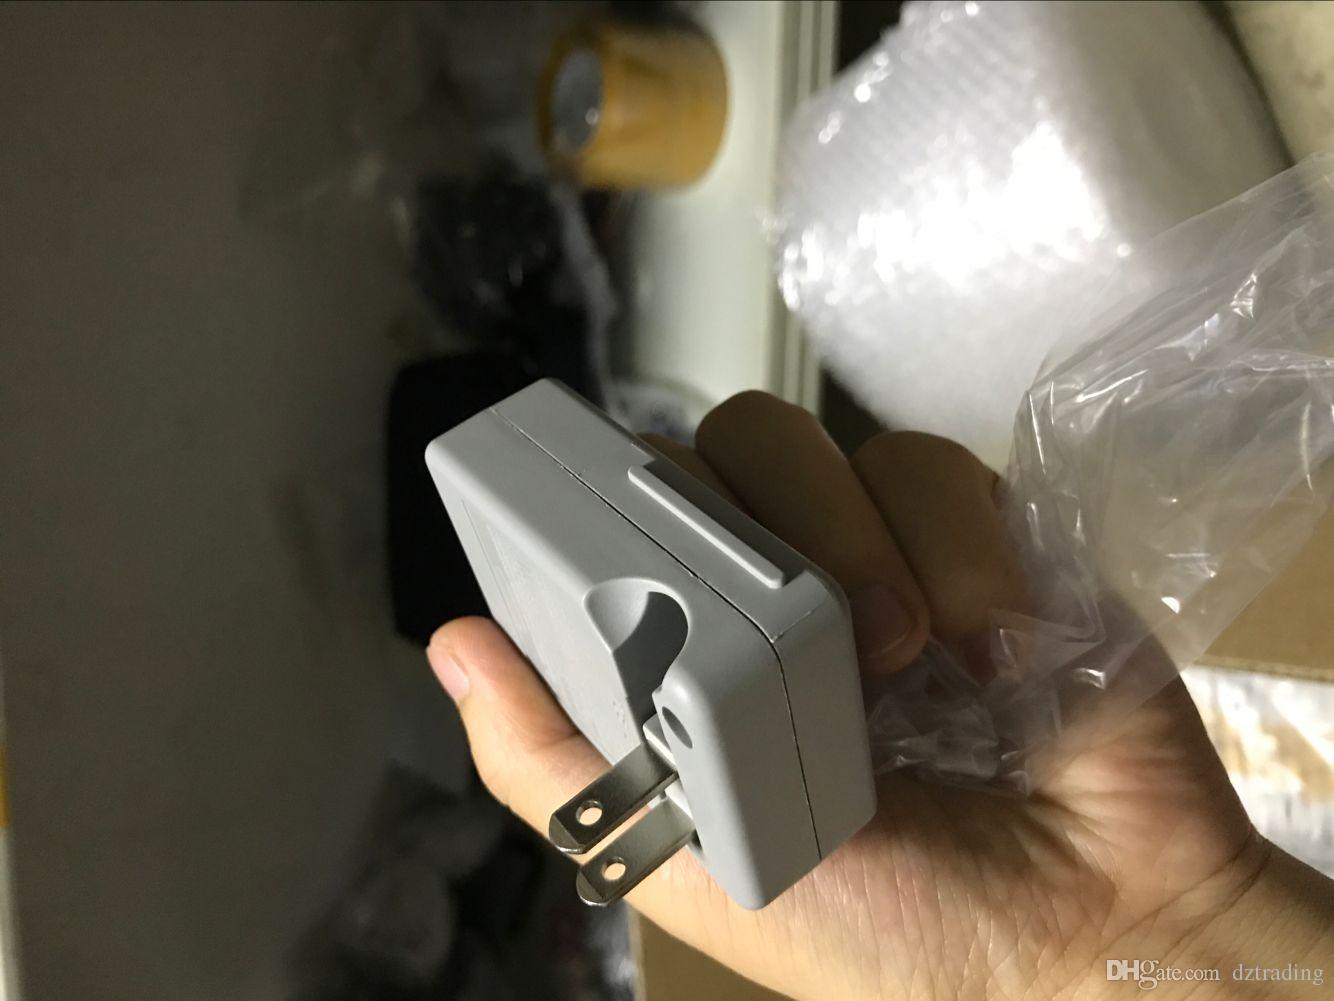 AC Güç Şarj Adaptörü Ev Duvar Seyahat Pil Şarj Kaynağı Kablosu kablosu Nintendo NDSi 3DS 3DSXL LL Dsi 50 adet